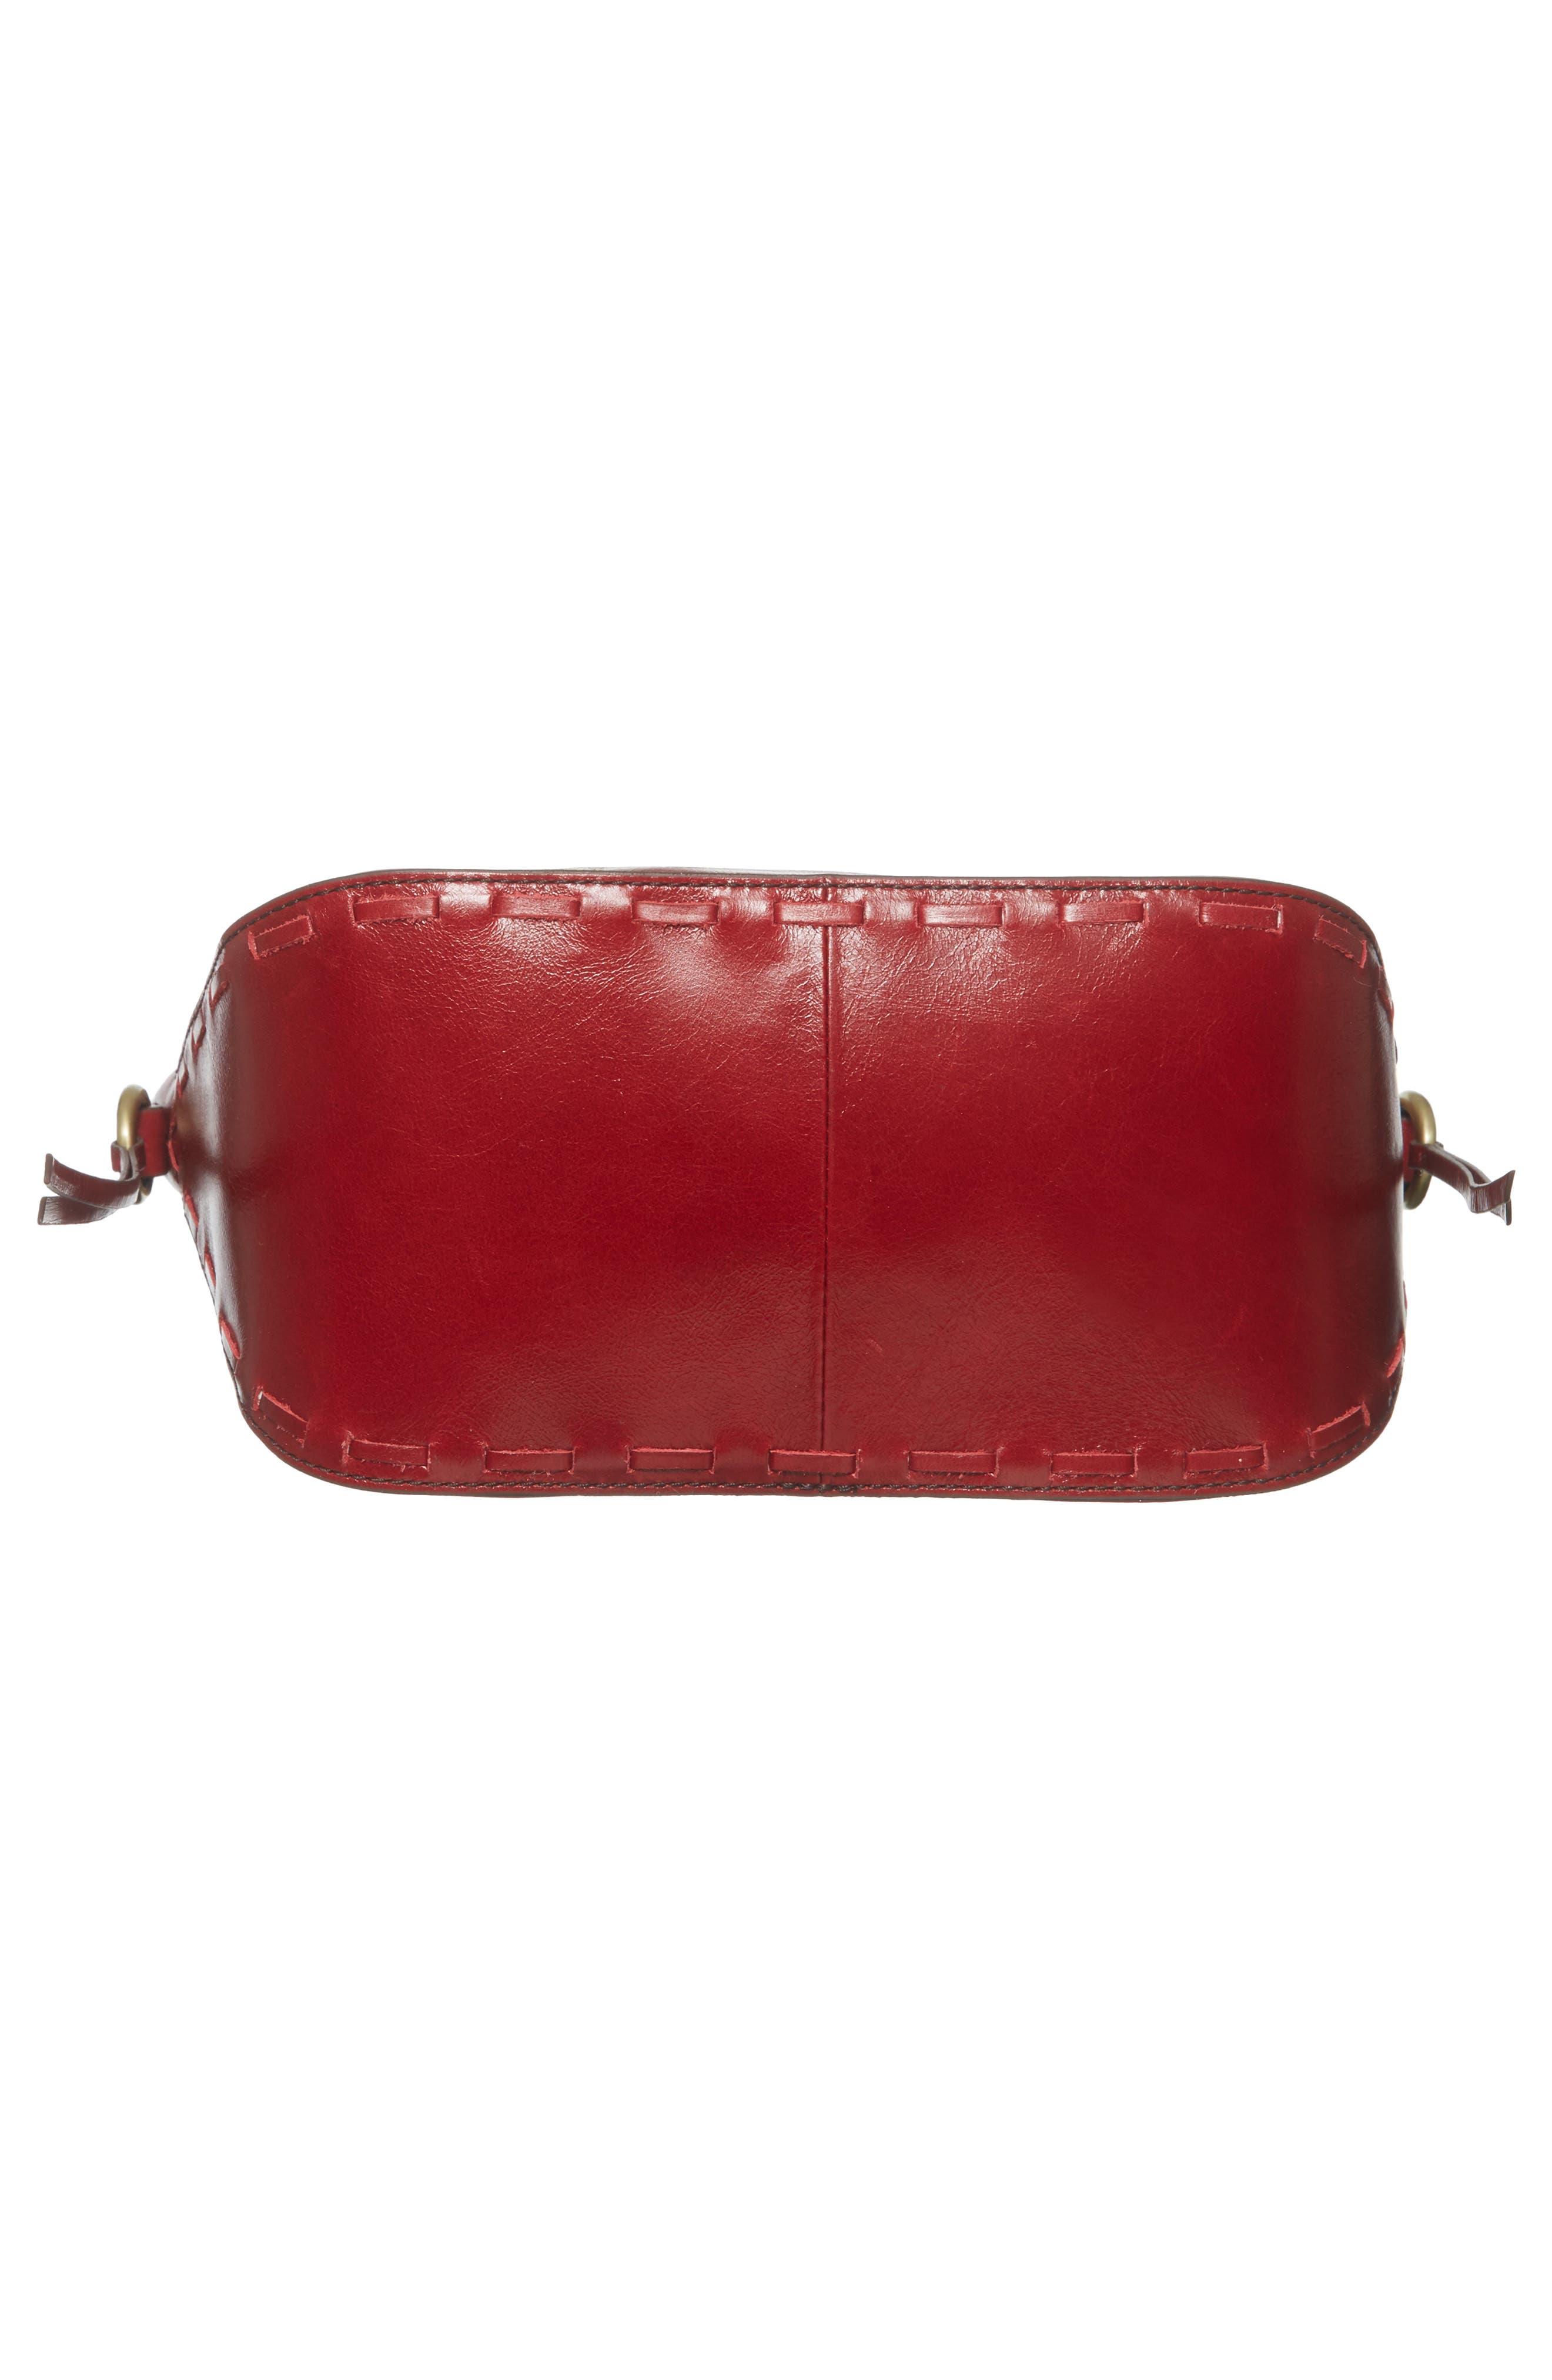 Muse Calfskin Leather Crossbody Bag,                             Alternate thumbnail 6, color,                             Cardinal